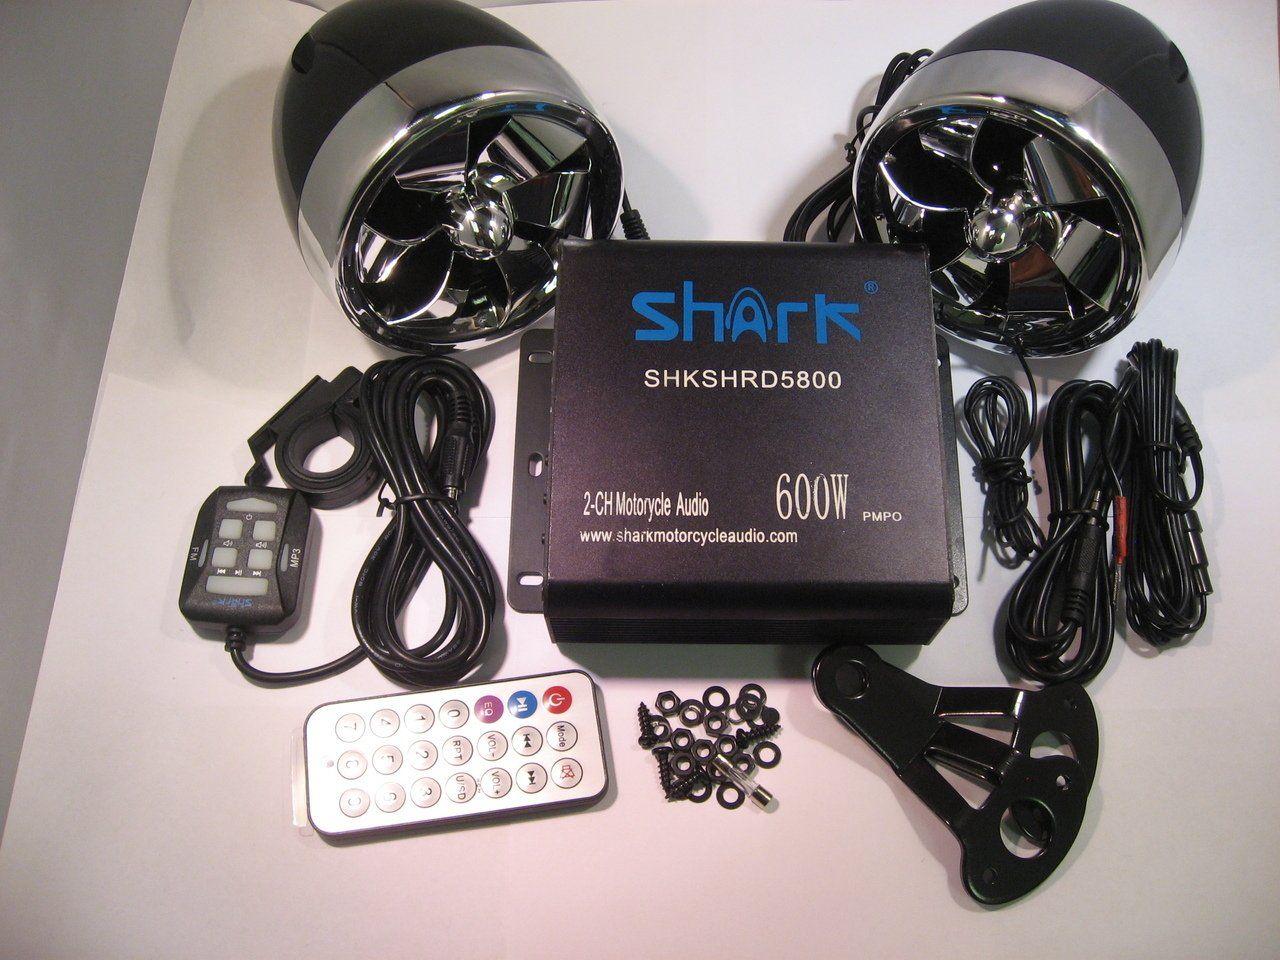 Shark Shkamp5800mx6800 600 Watt Motorcycle Marine Audio System w ...